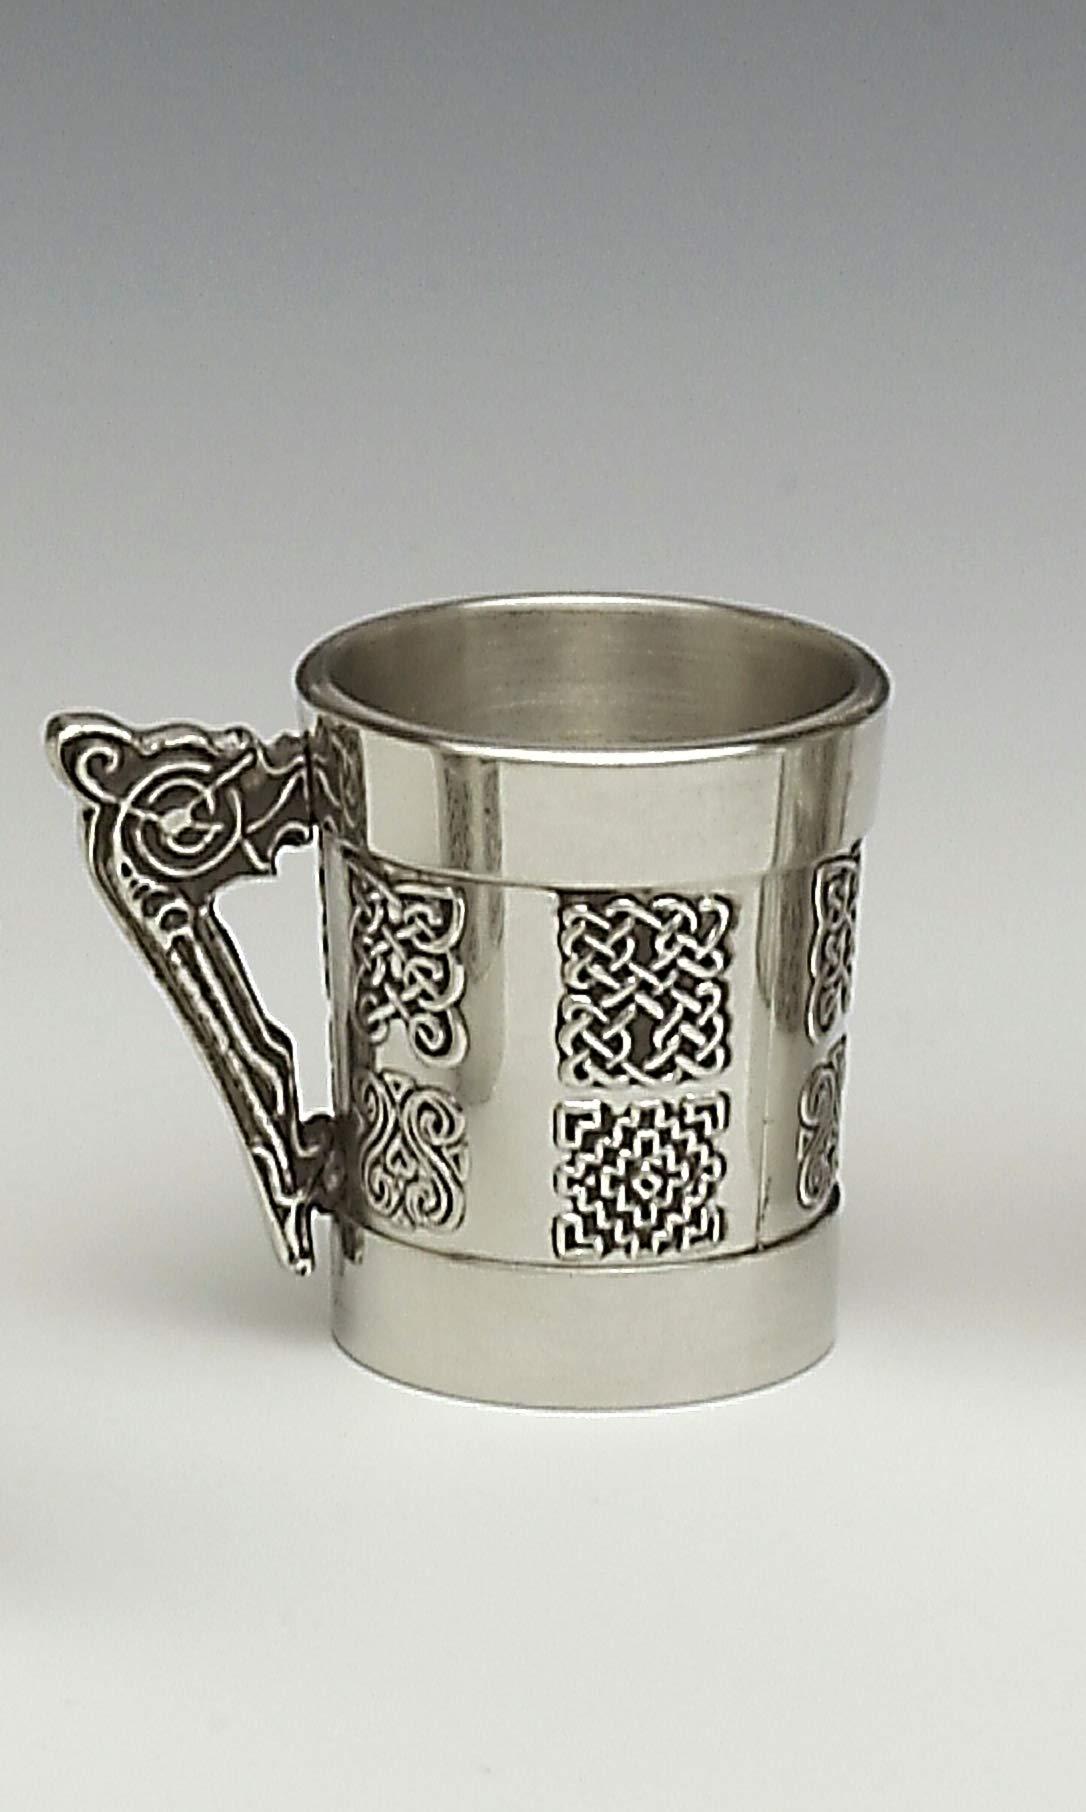 Mullingar Pewter Whiskey Measure With Celtic Handle And Celtic Design by Mullingar Pewter